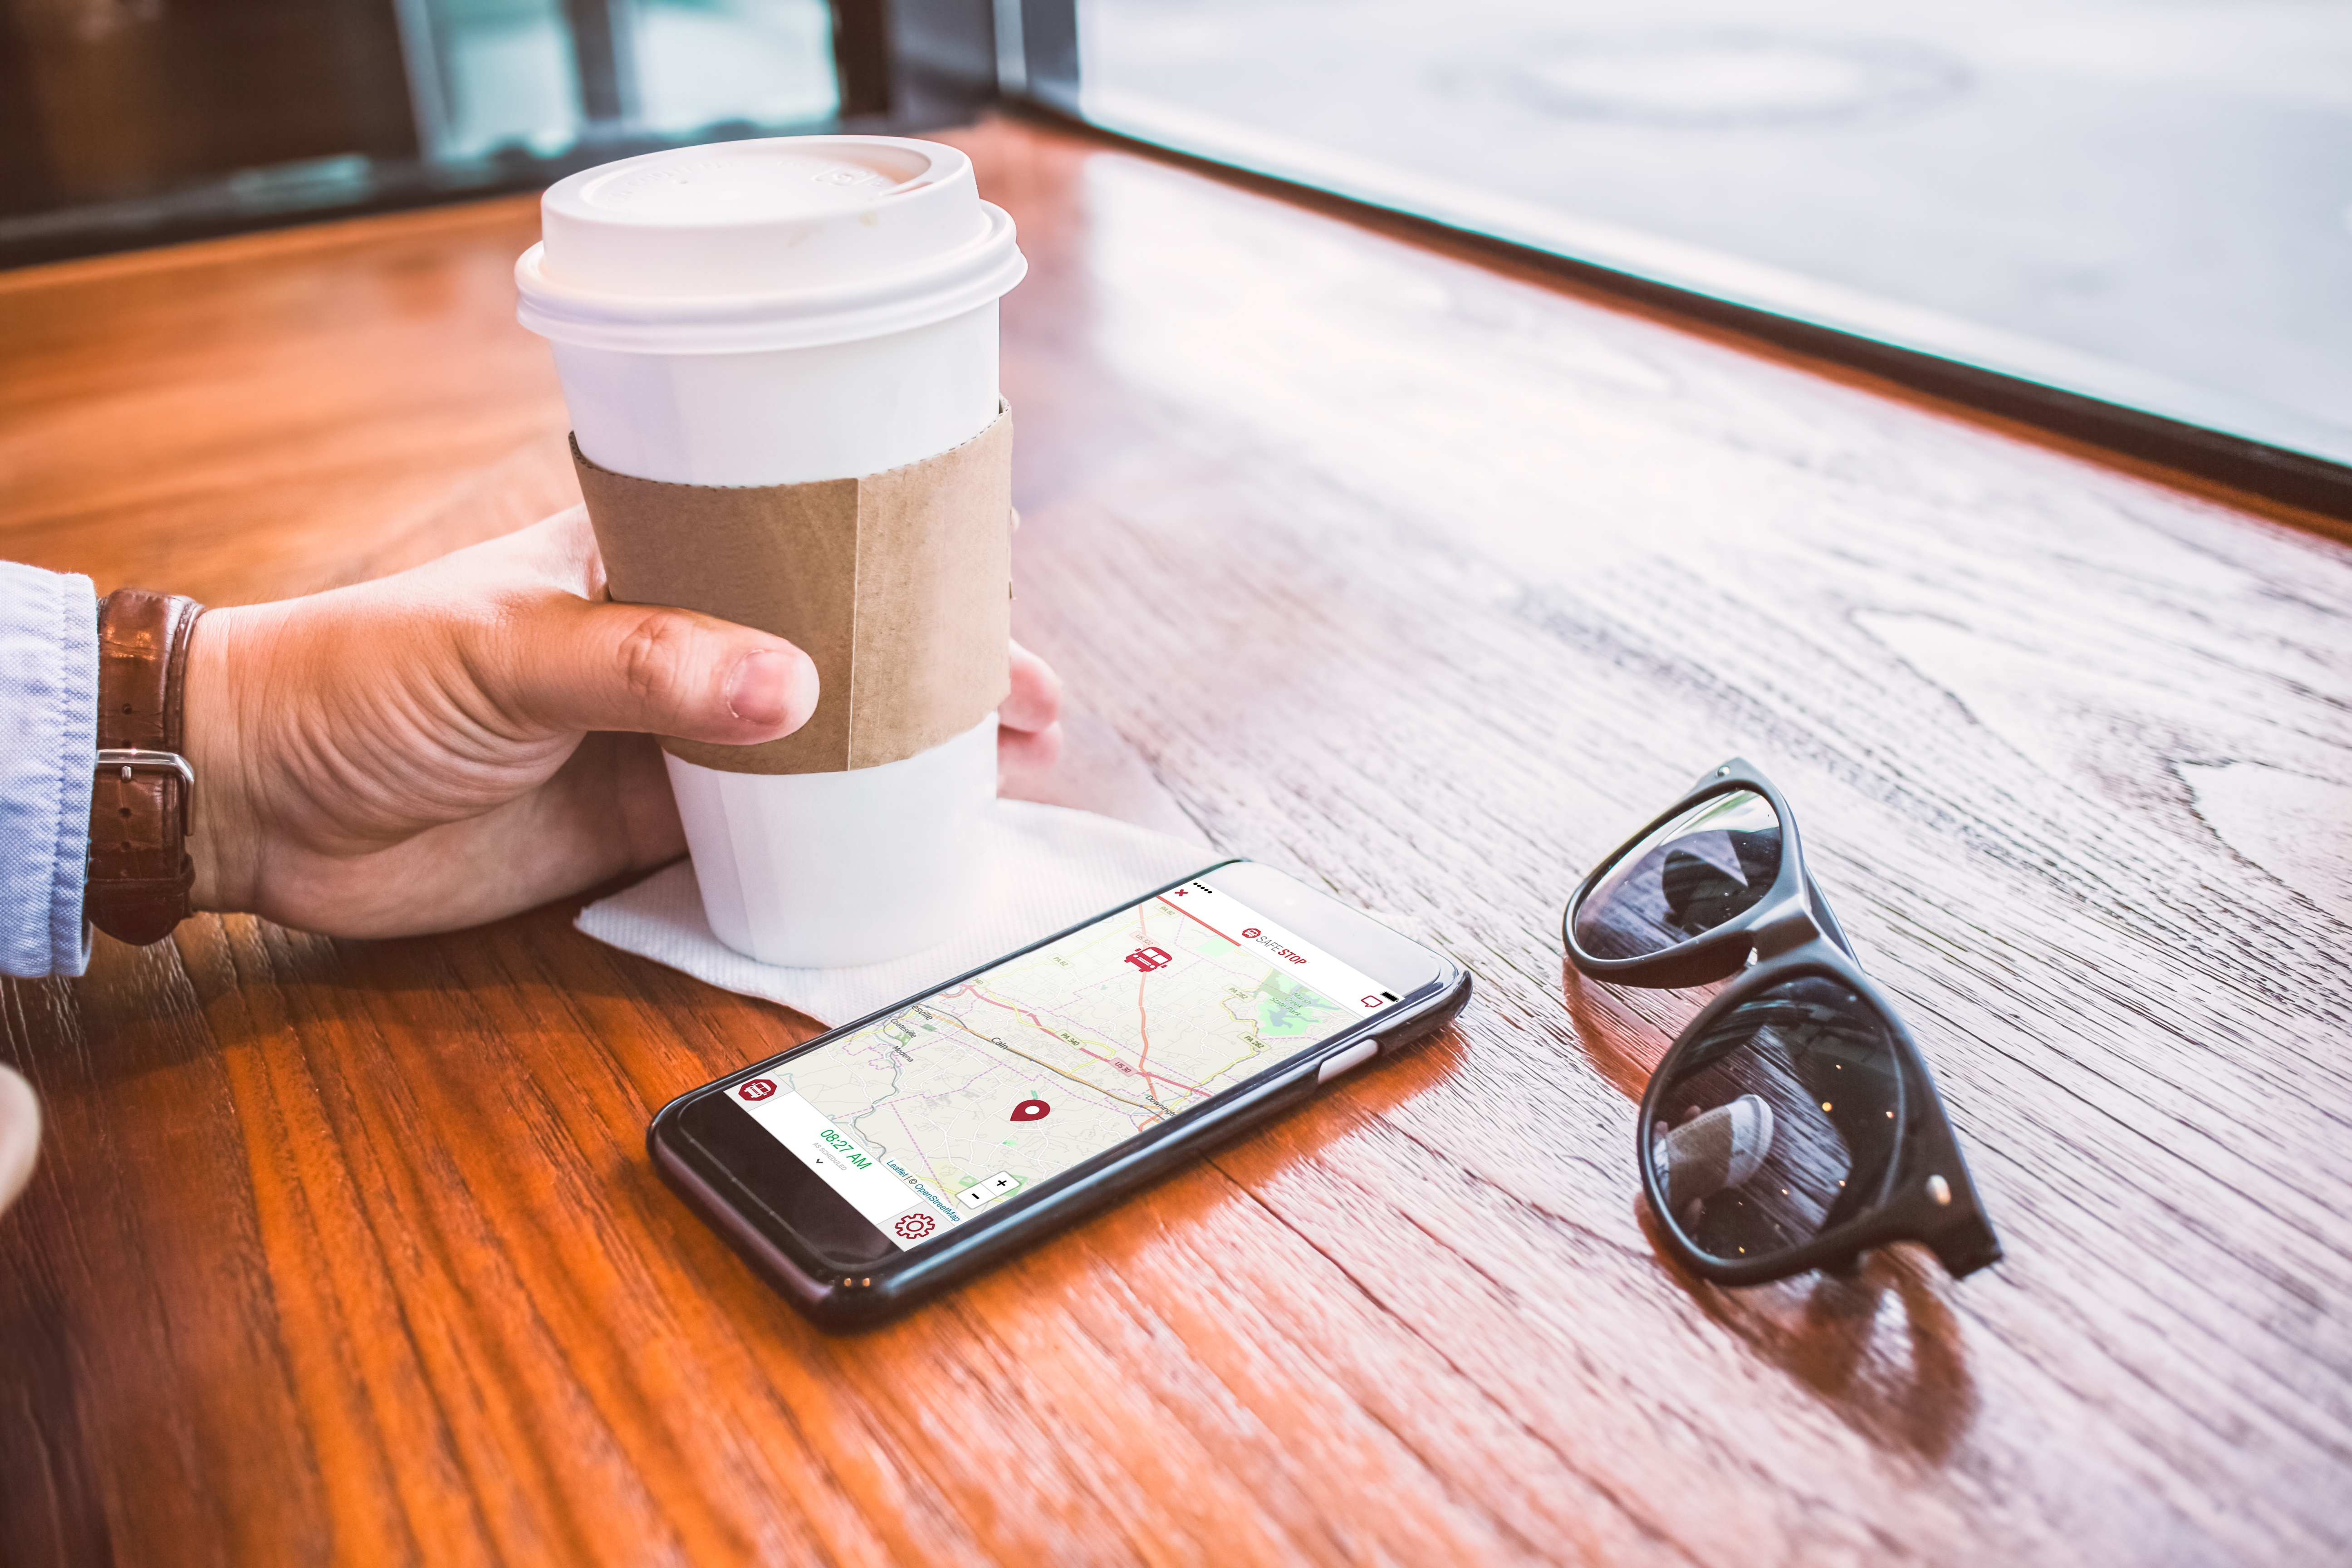 Schools-Bus-Fleet-Student-Transportation-Technology-coffee-1.jpg